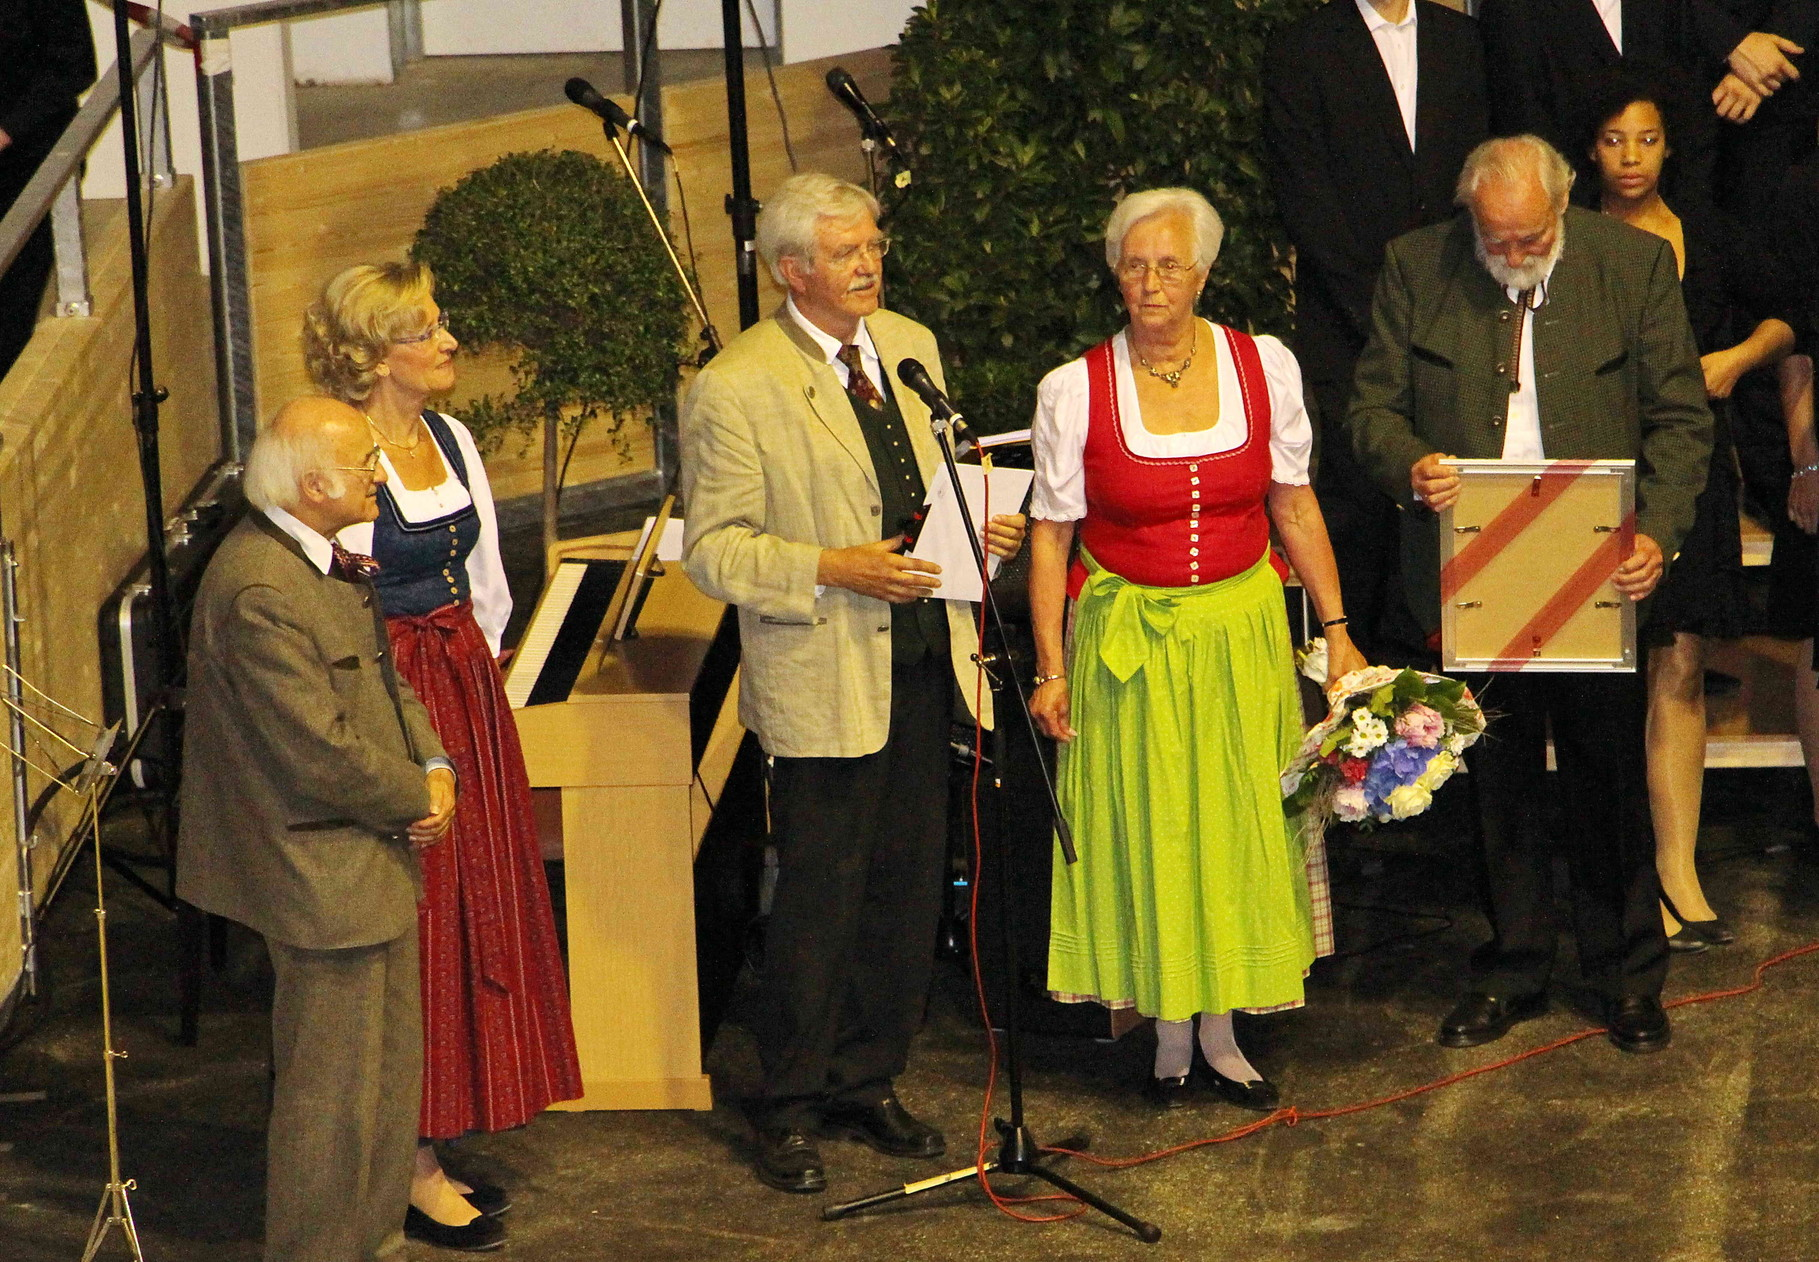 Sixtus Lampl, Heide Hauser, Karl B. Kögl, Christl Kamseder und Rudolf Sommer